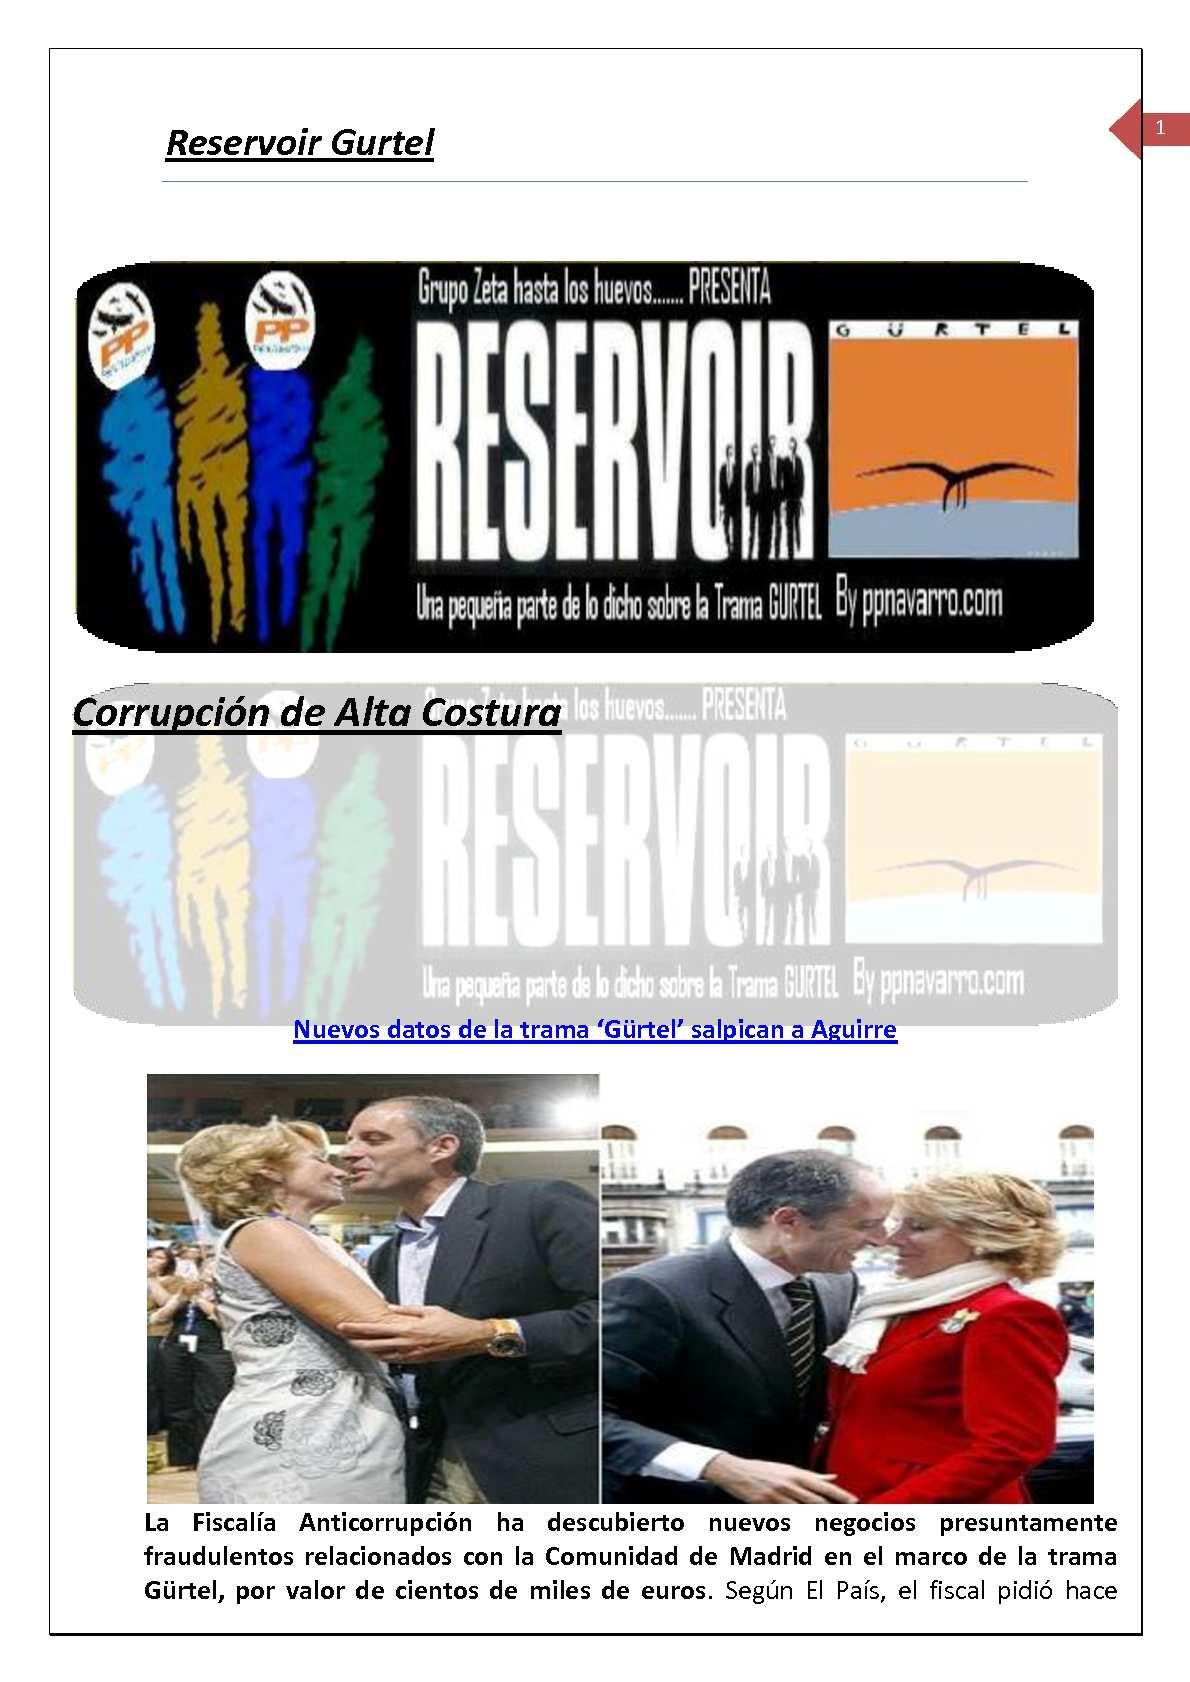 Calaméo - Reservoir Gurtel. Corrupcion de alta costura